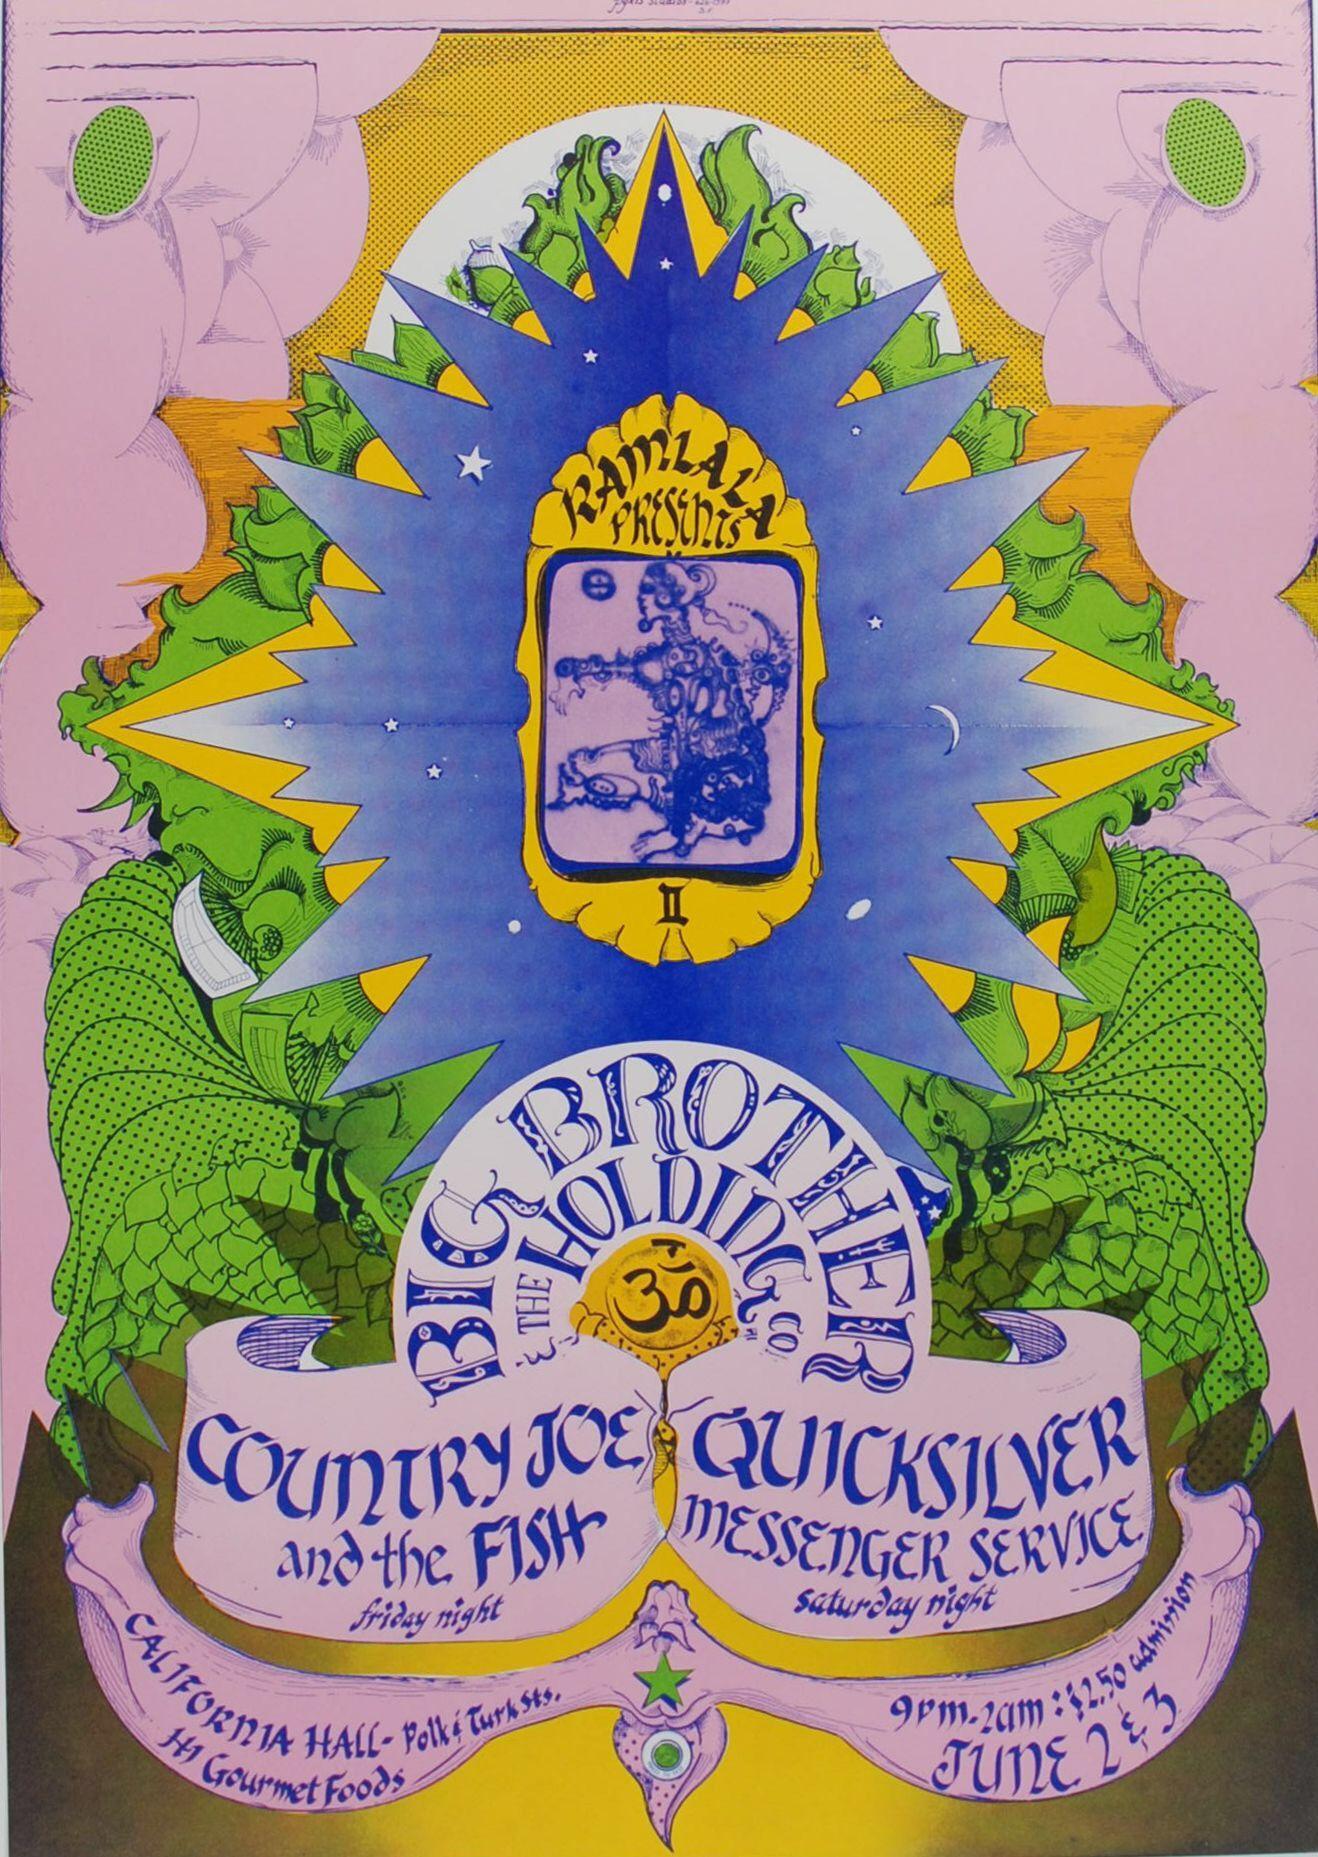 Big Brother / Quicksilver / Country Joe show at California Hall 1967.